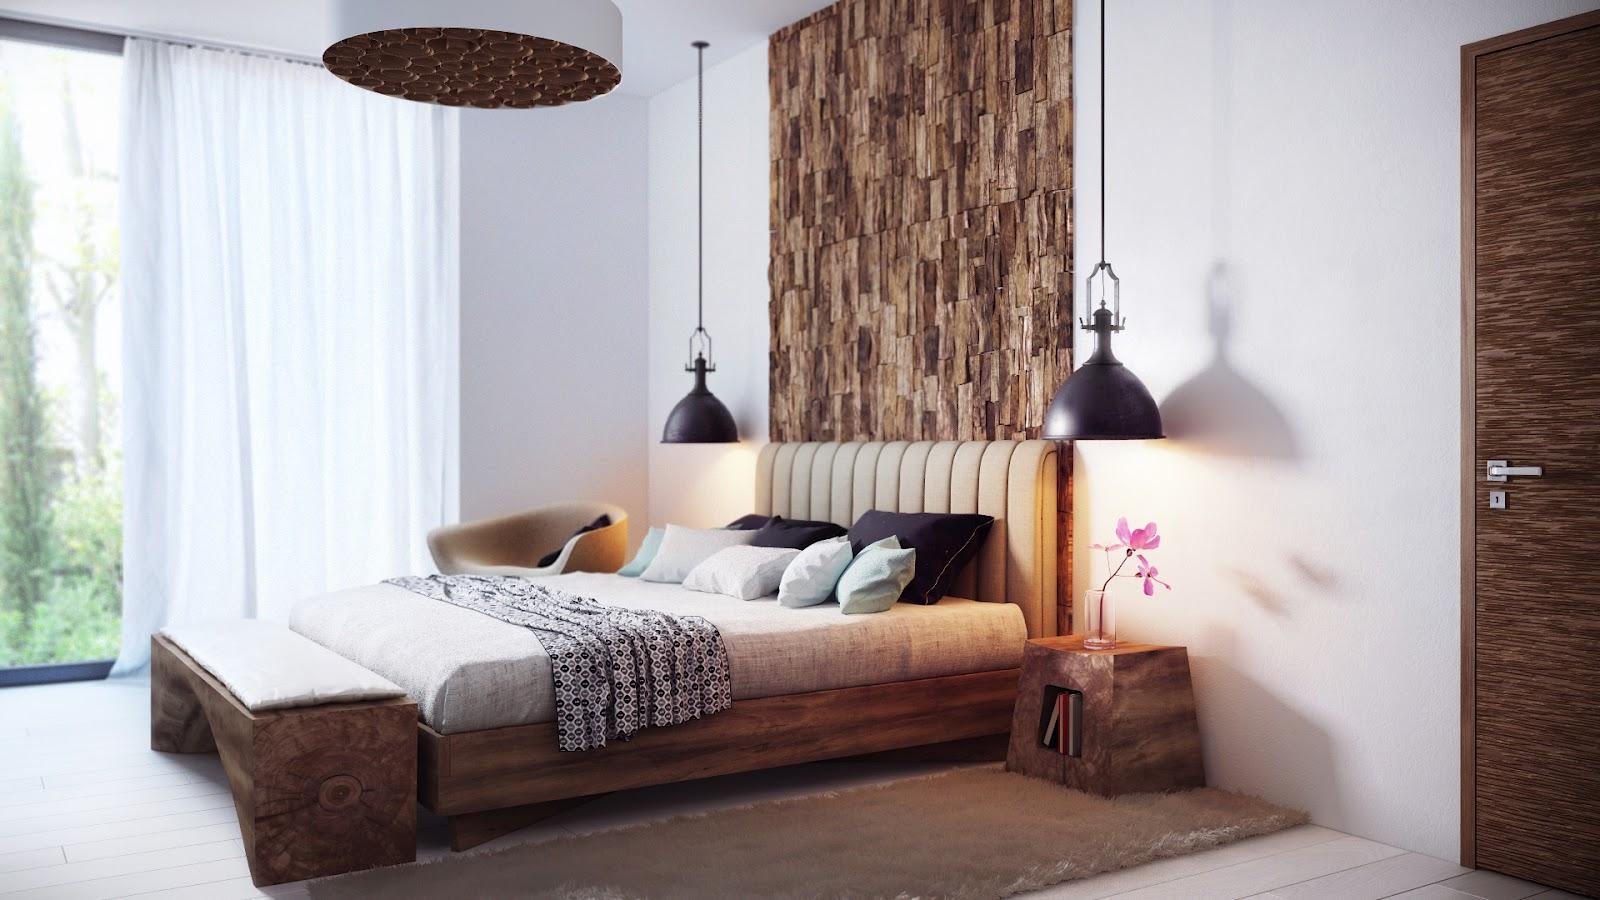 Cozy minimalist bedroom by Alexander Uglyanitsa 2